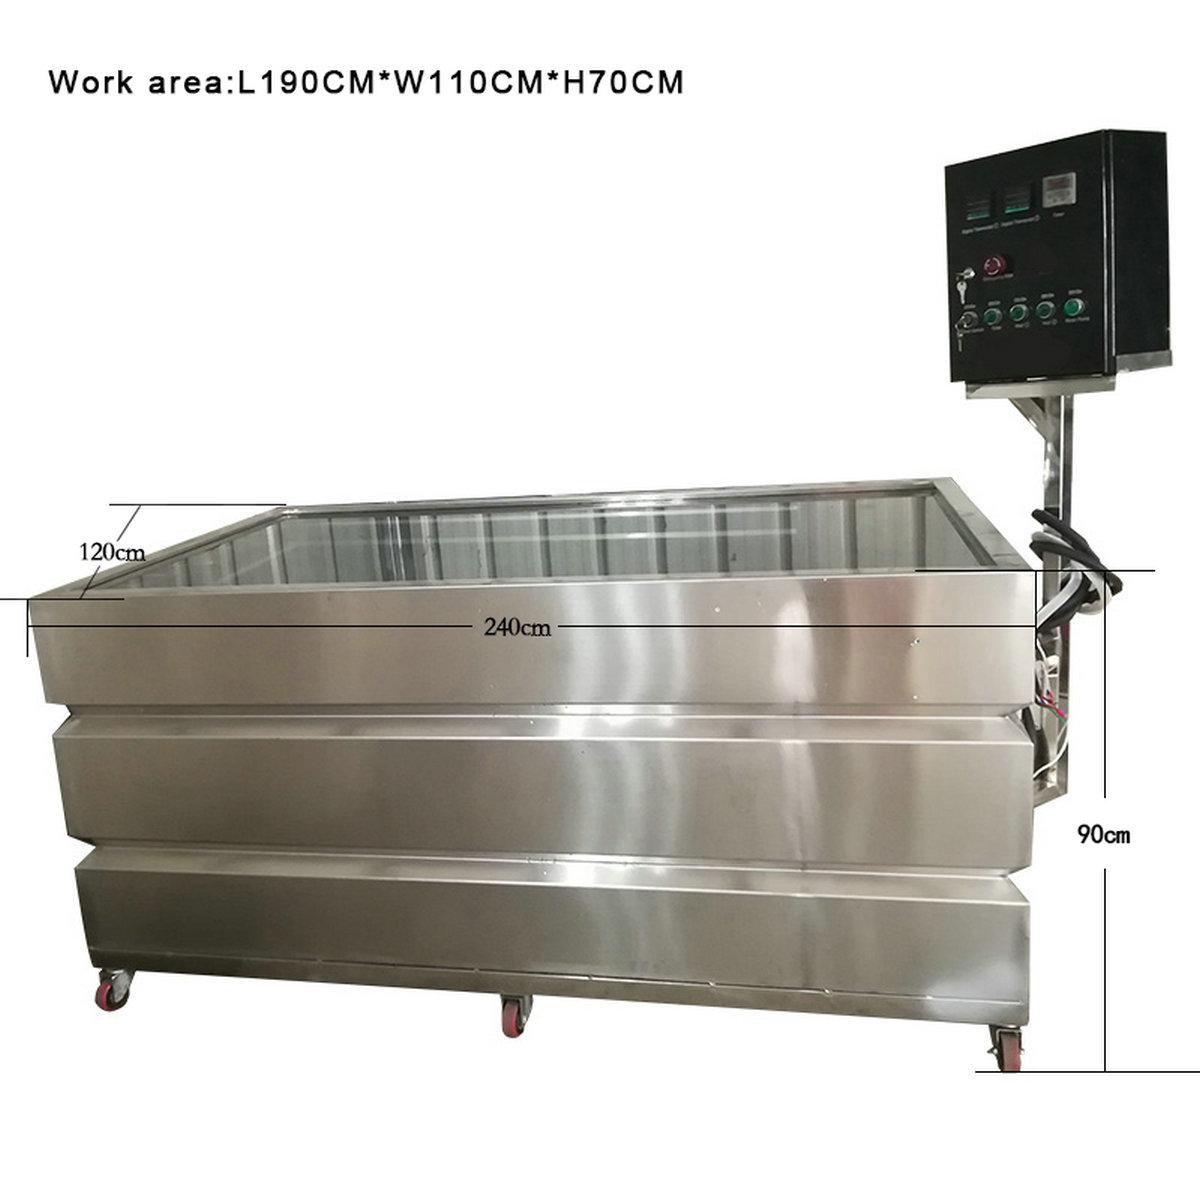 2.4m standard hydro dip tank